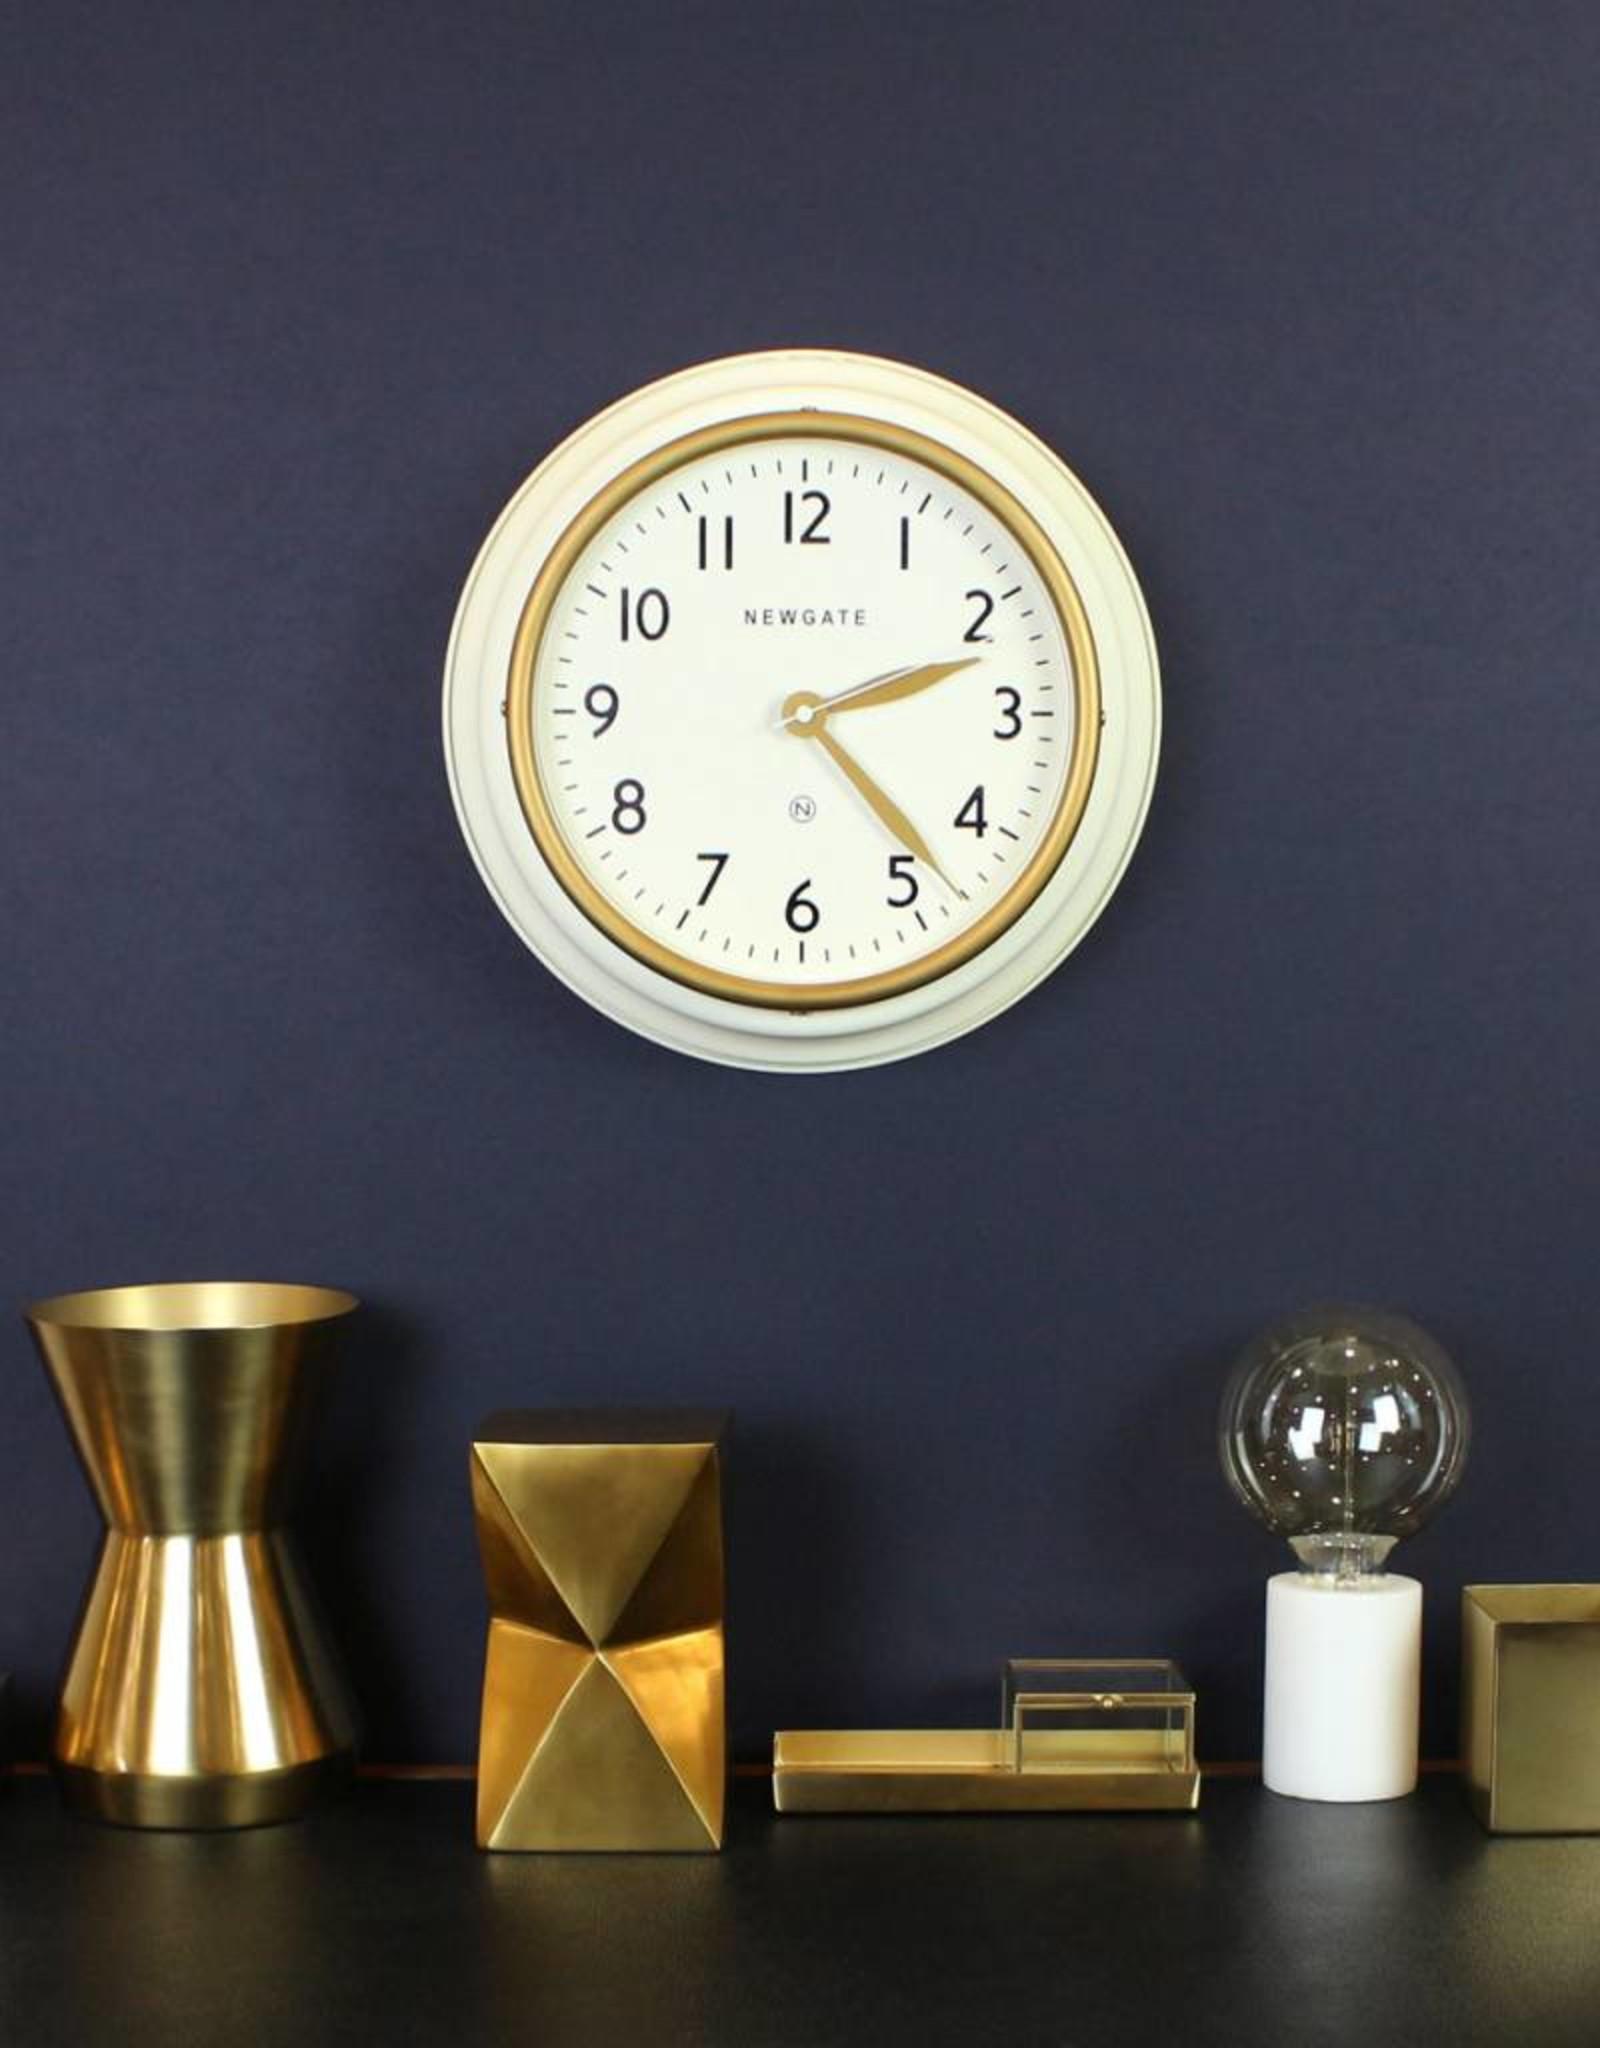 Newgate The Cookhouse Clock